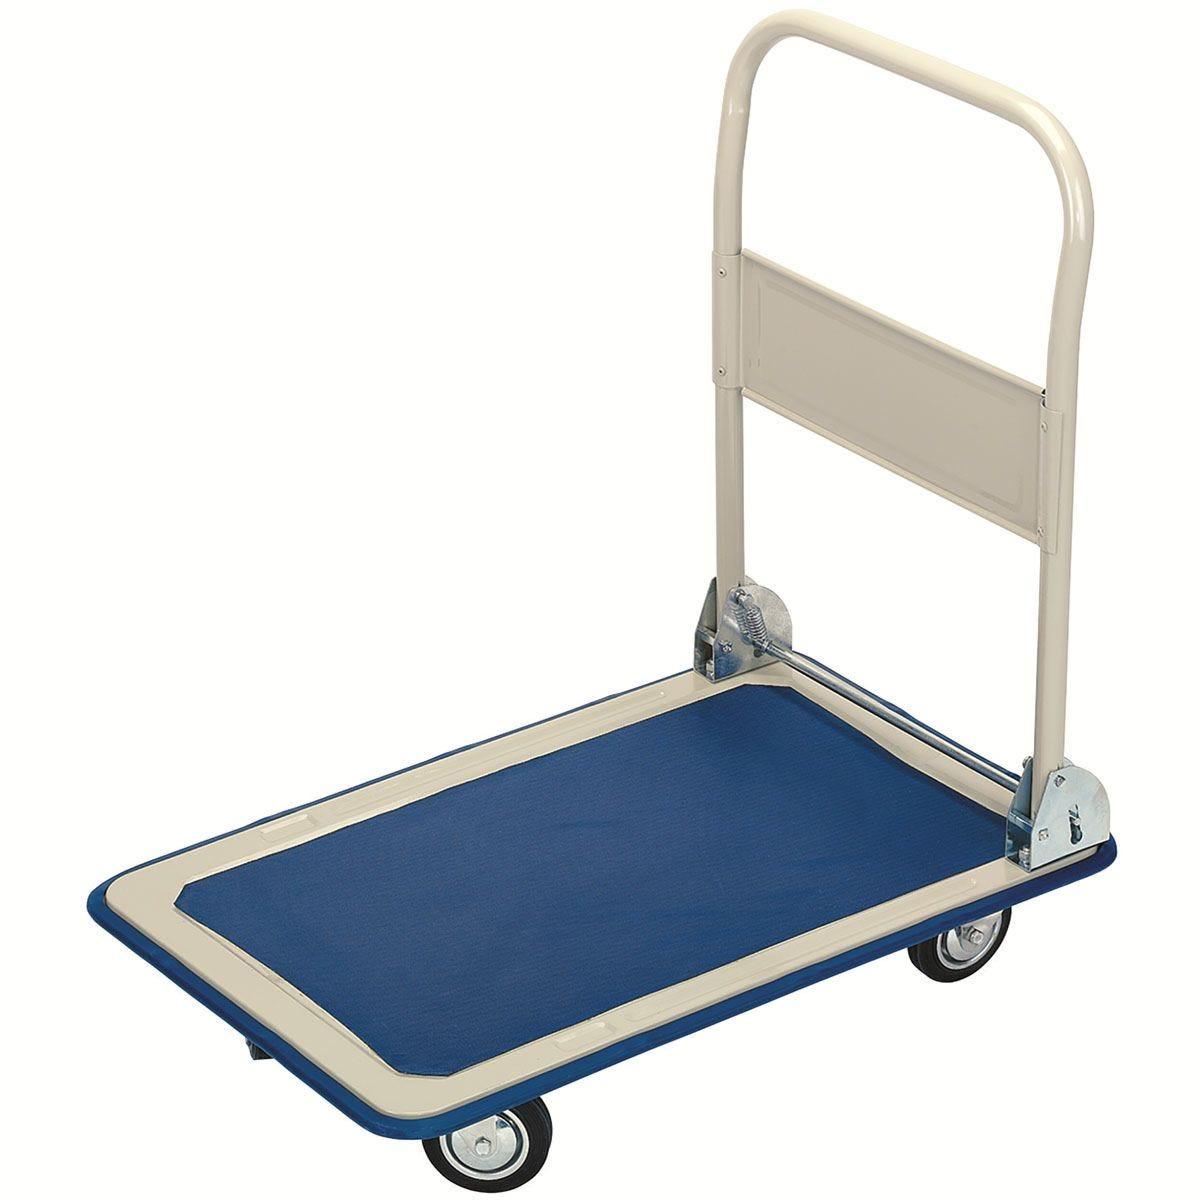 Draper 150kg Platform Trolley with Folding Handle (630mm x 480mm x 850mm)